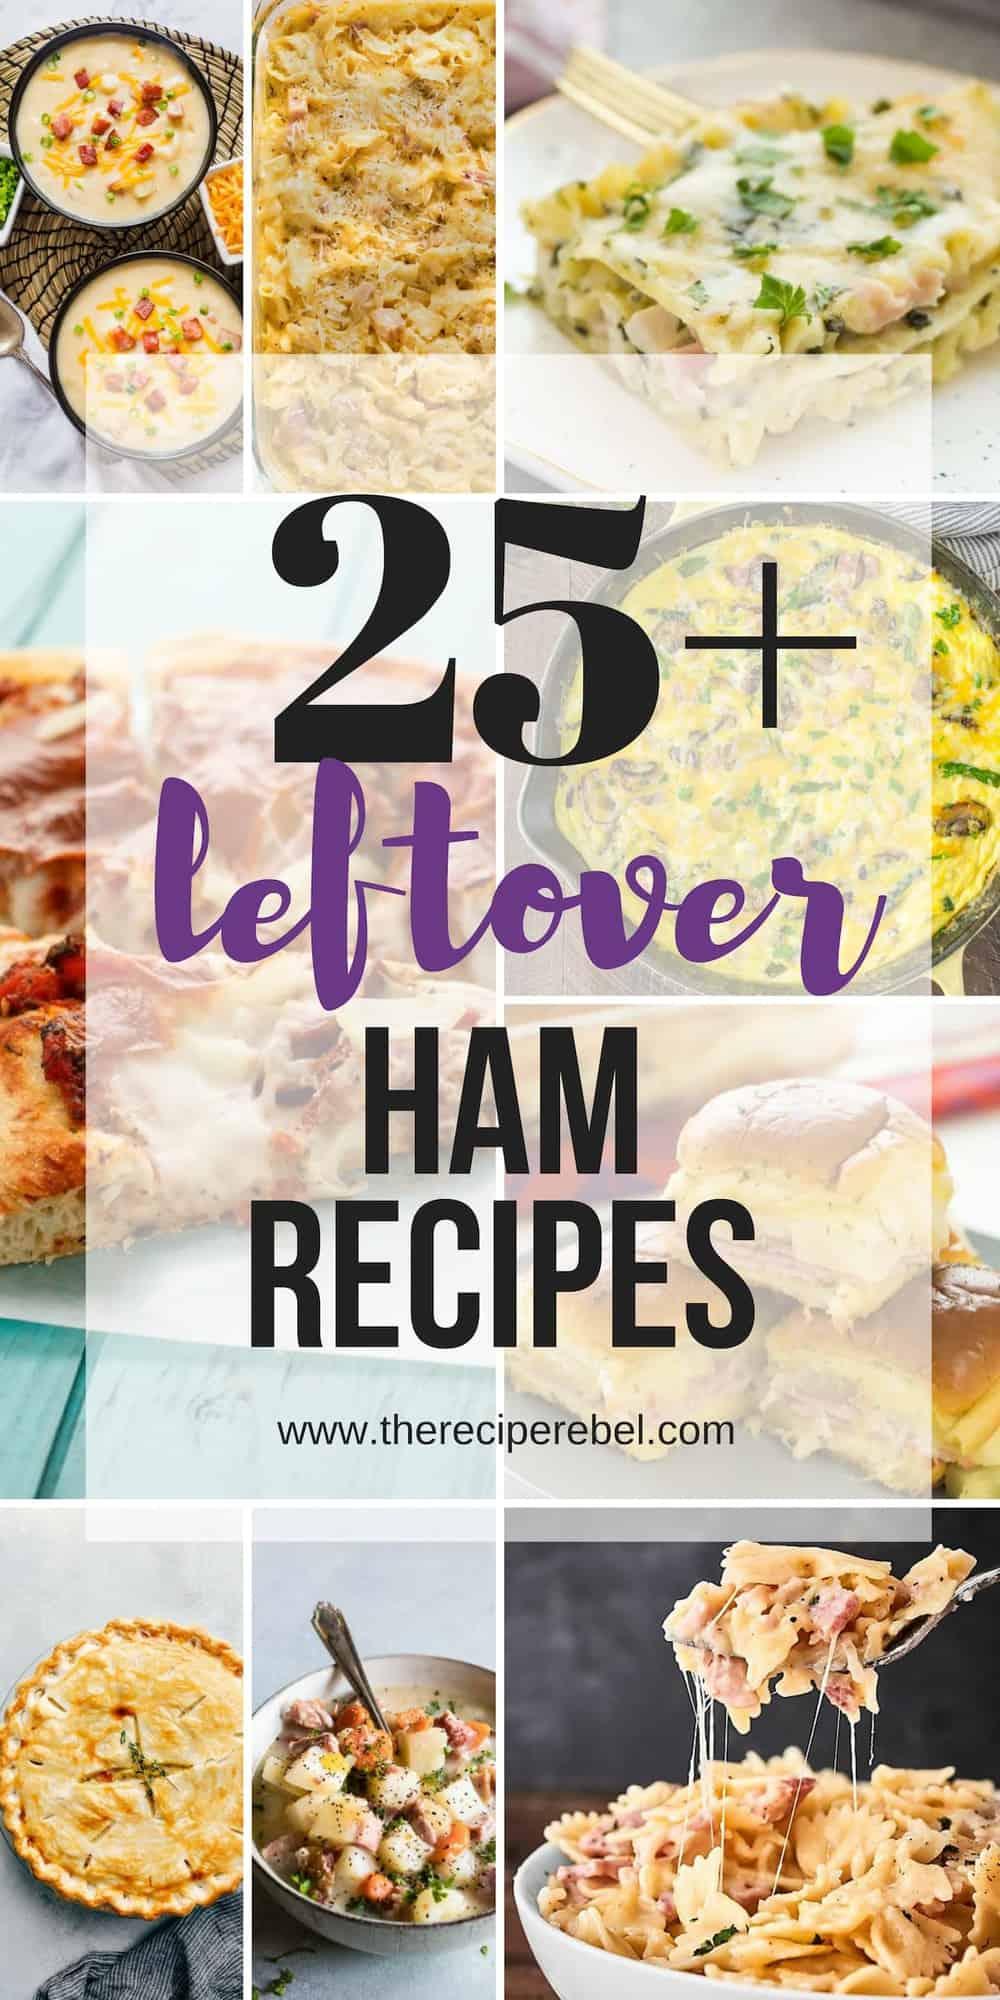 leftover ham recipes long collage